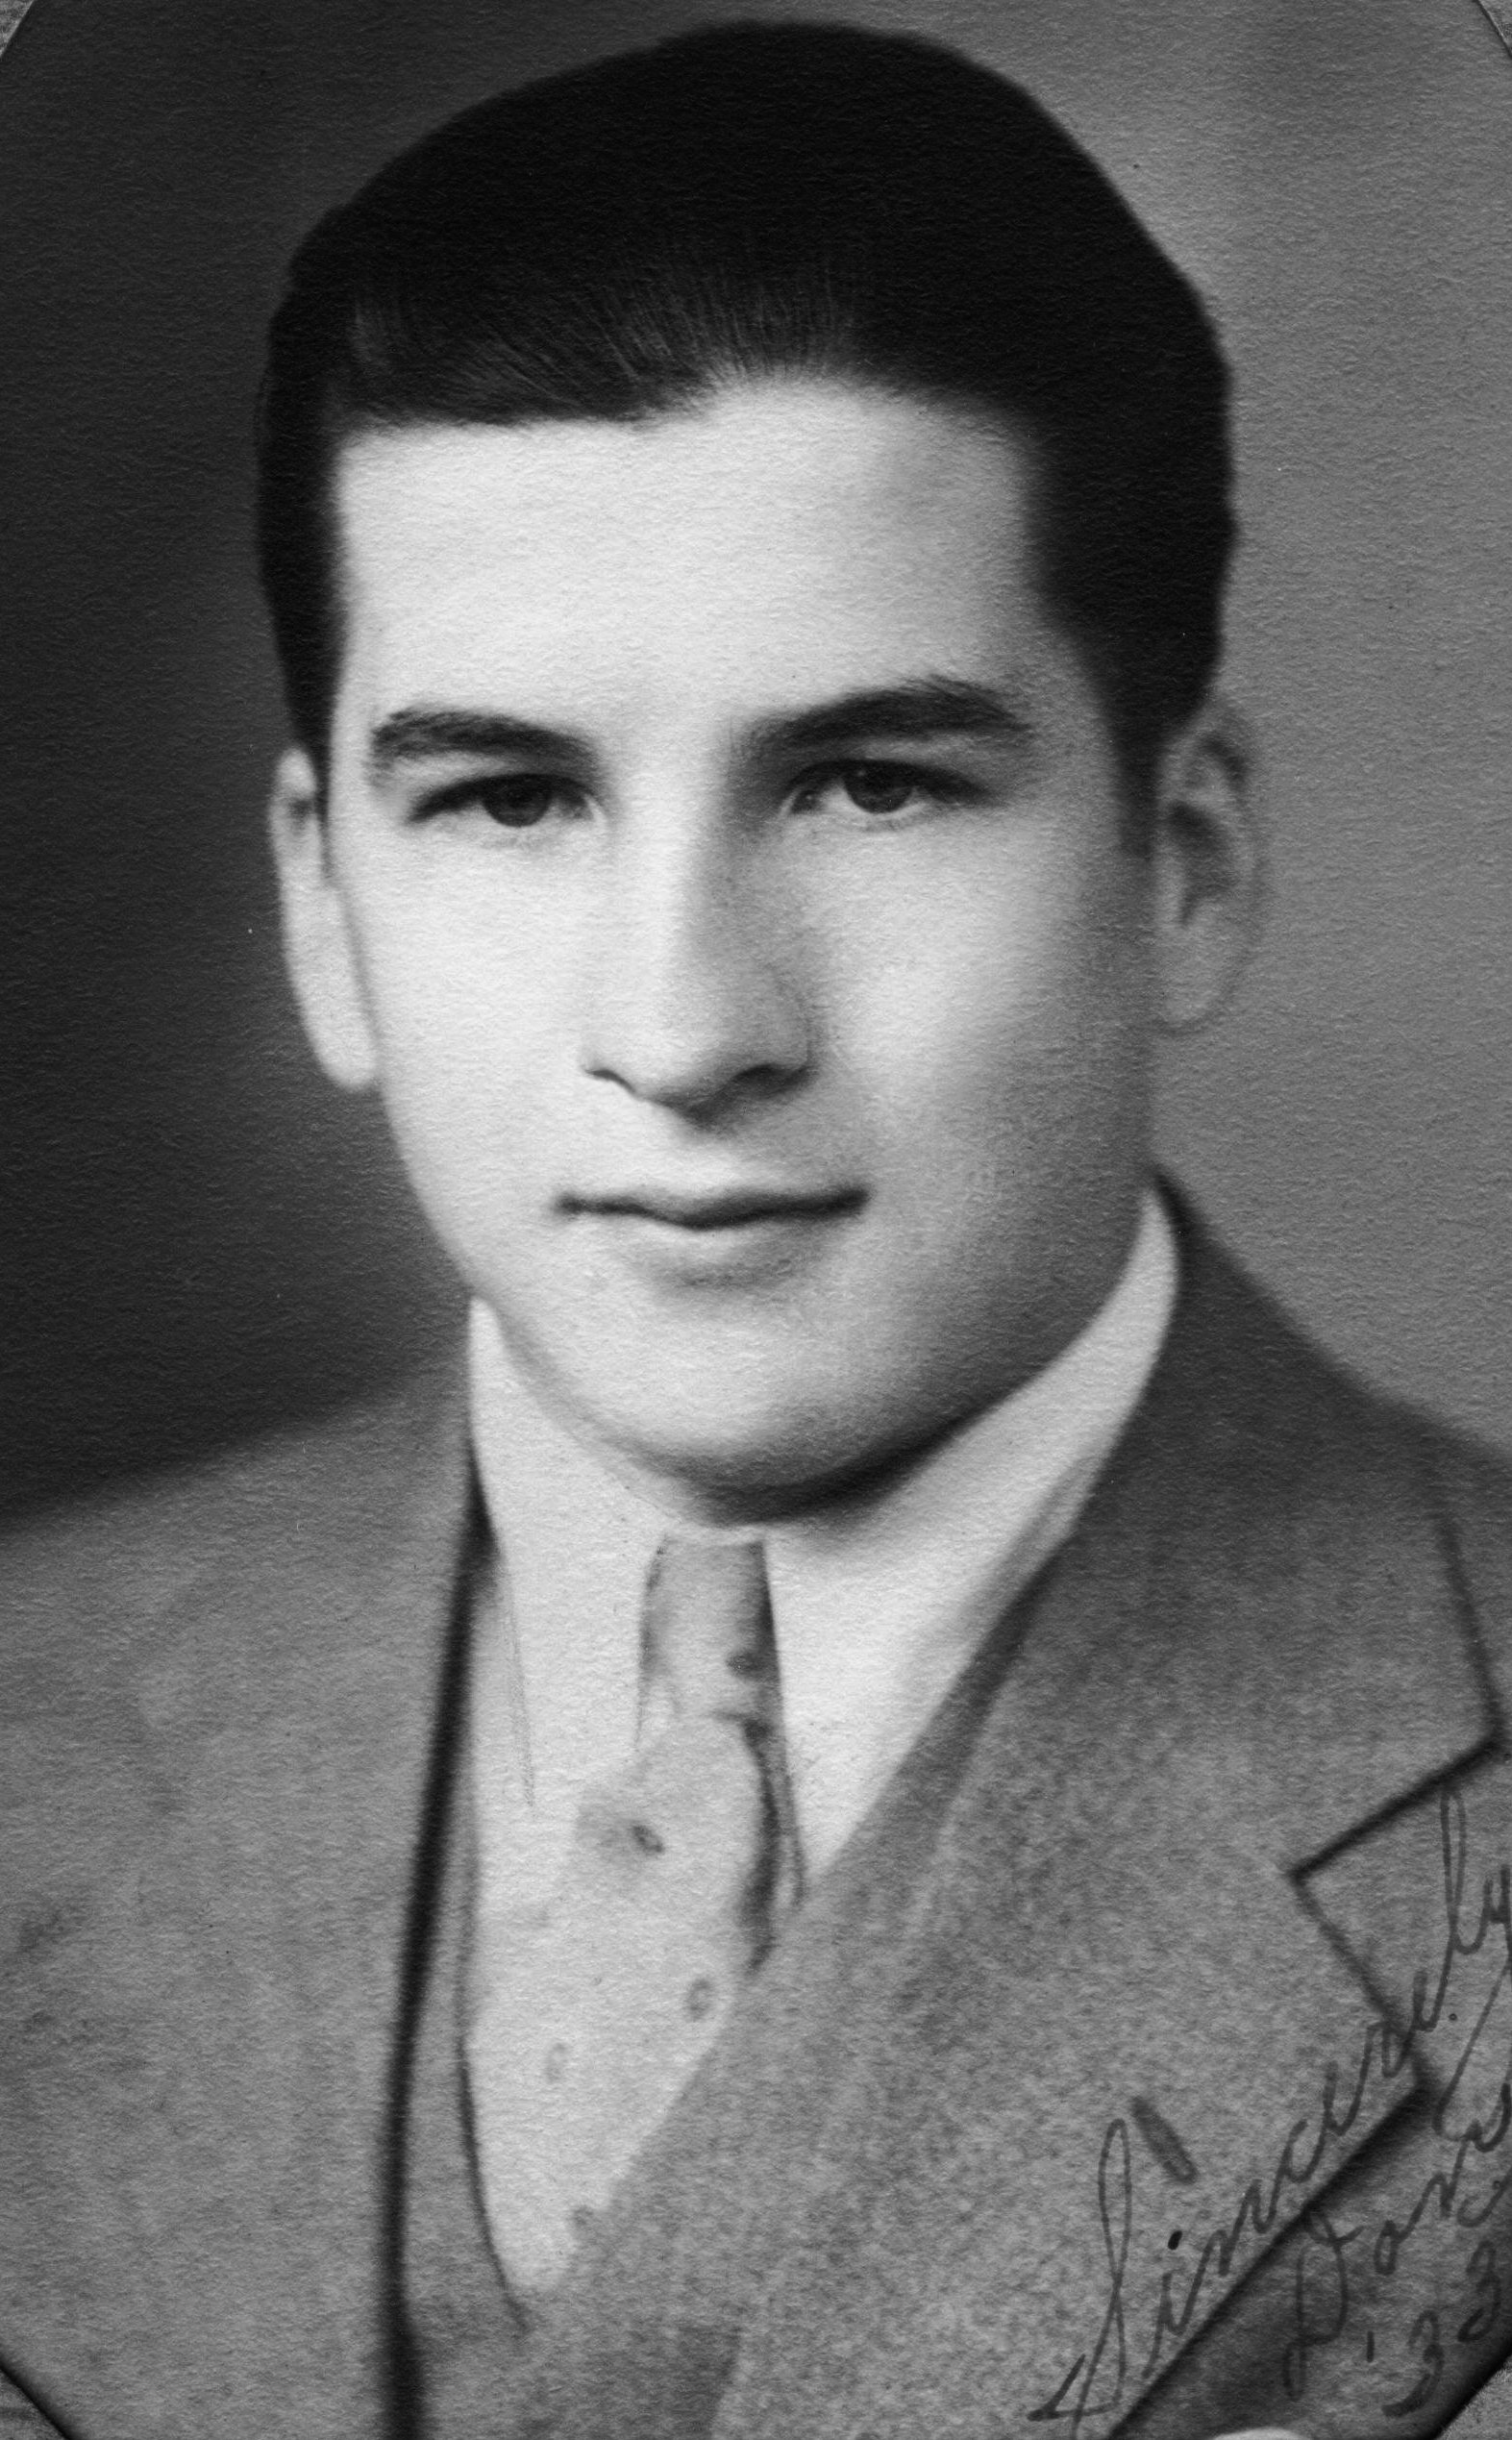 Greenwood, Donald Burgon